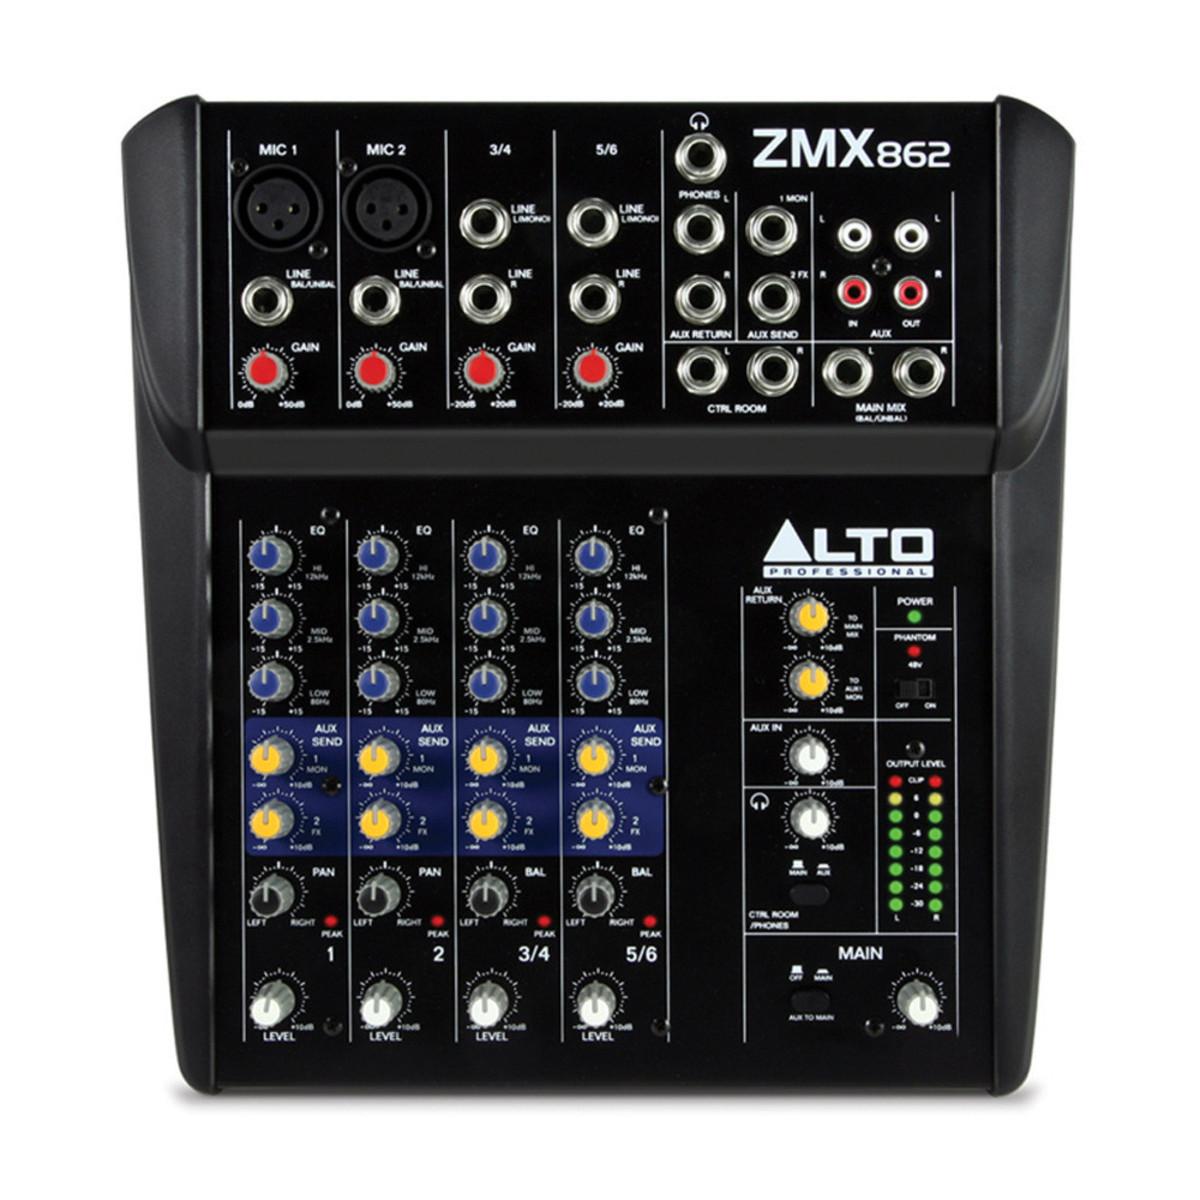 ALTO PROFESSIONAL ZEPHYR ZMX862 MIXER COMPATTO 6 CANALI  ZMX-862